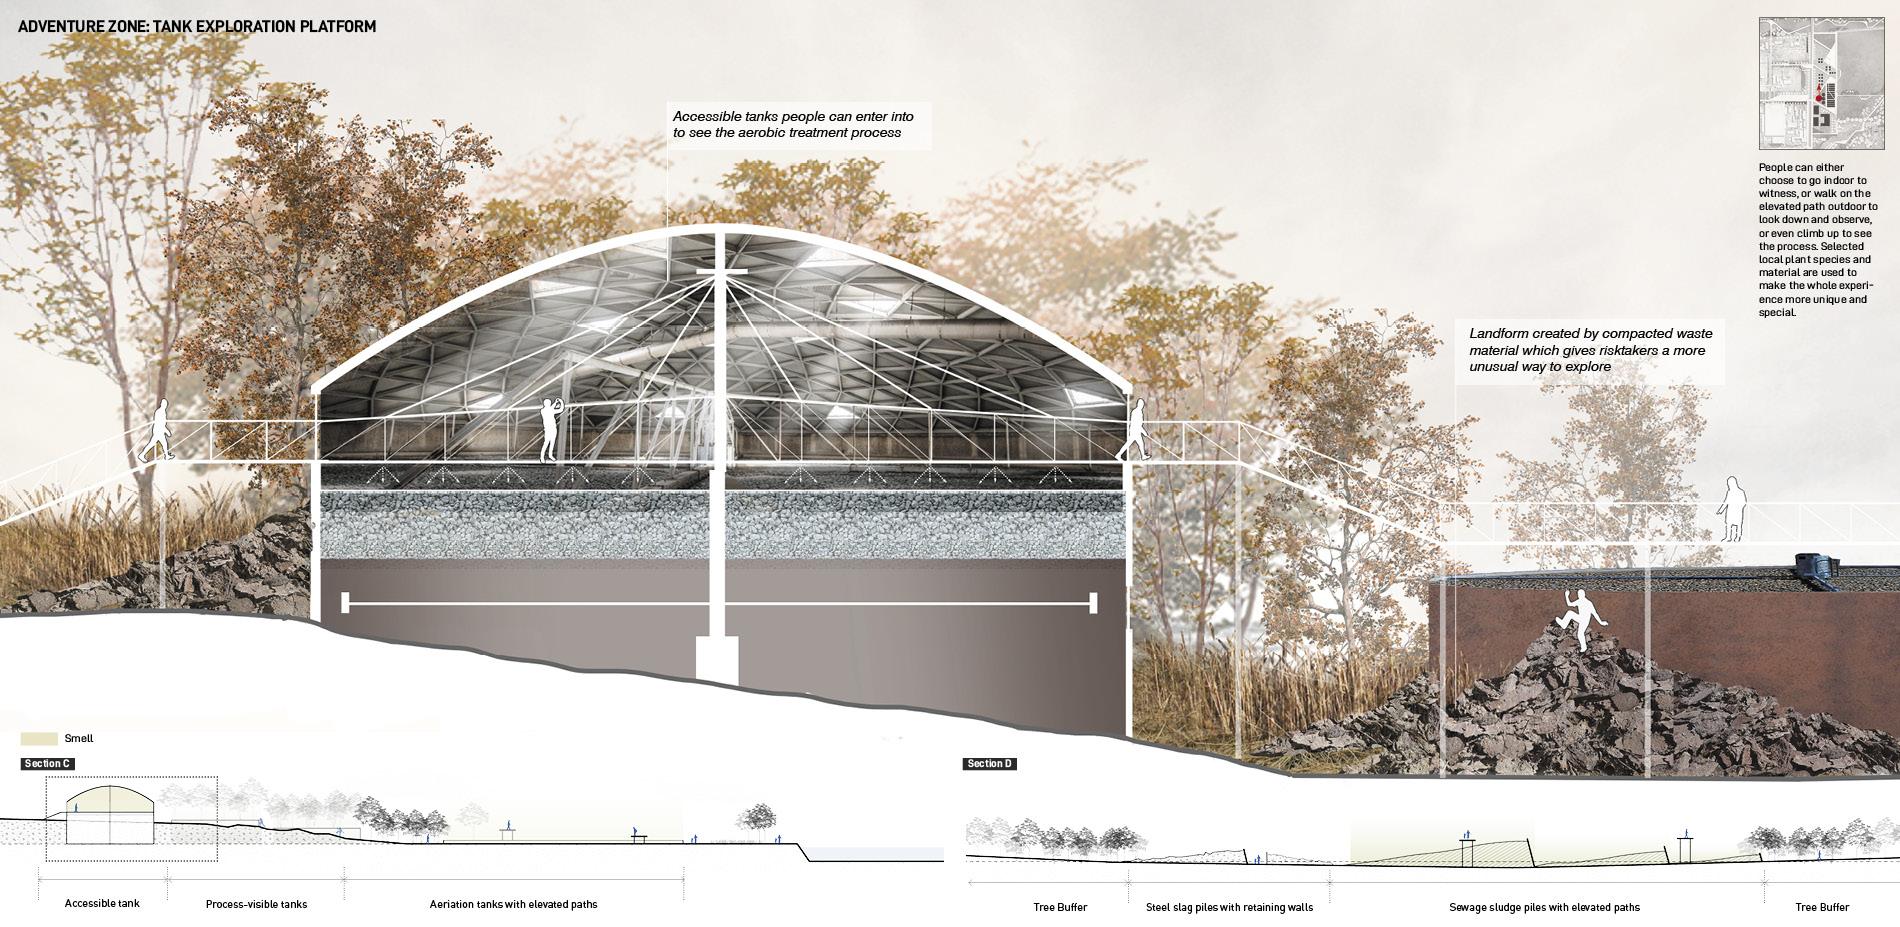 Sewage Plant Vision: Tank Exploration